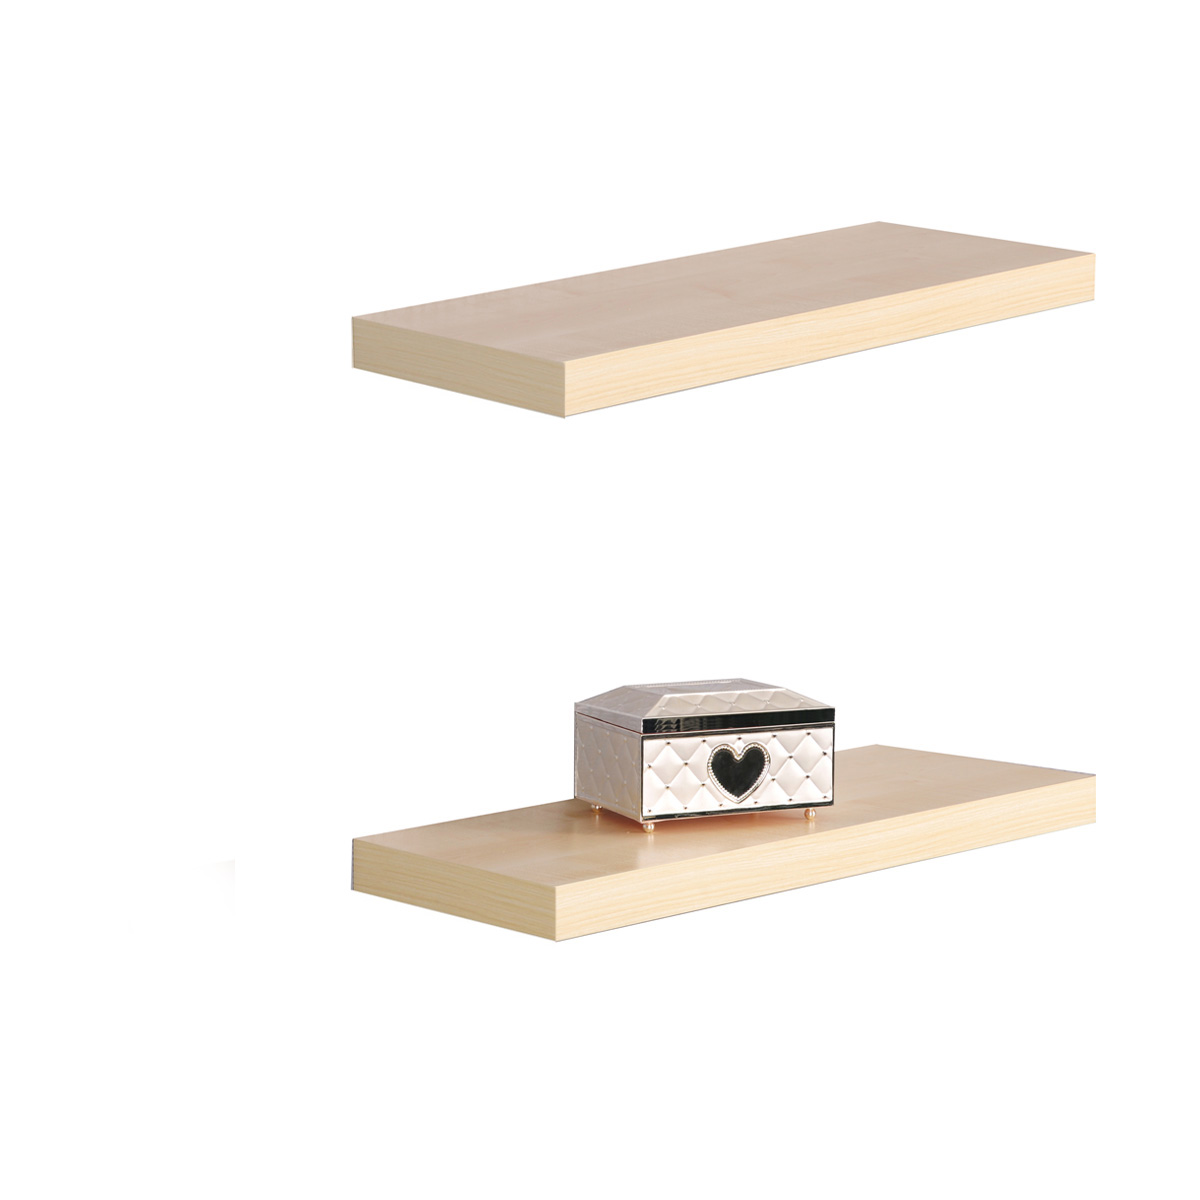 wandboard 2er set tuna 2 wandregal 60cm buche dekor versteckte befestigung ebay. Black Bedroom Furniture Sets. Home Design Ideas